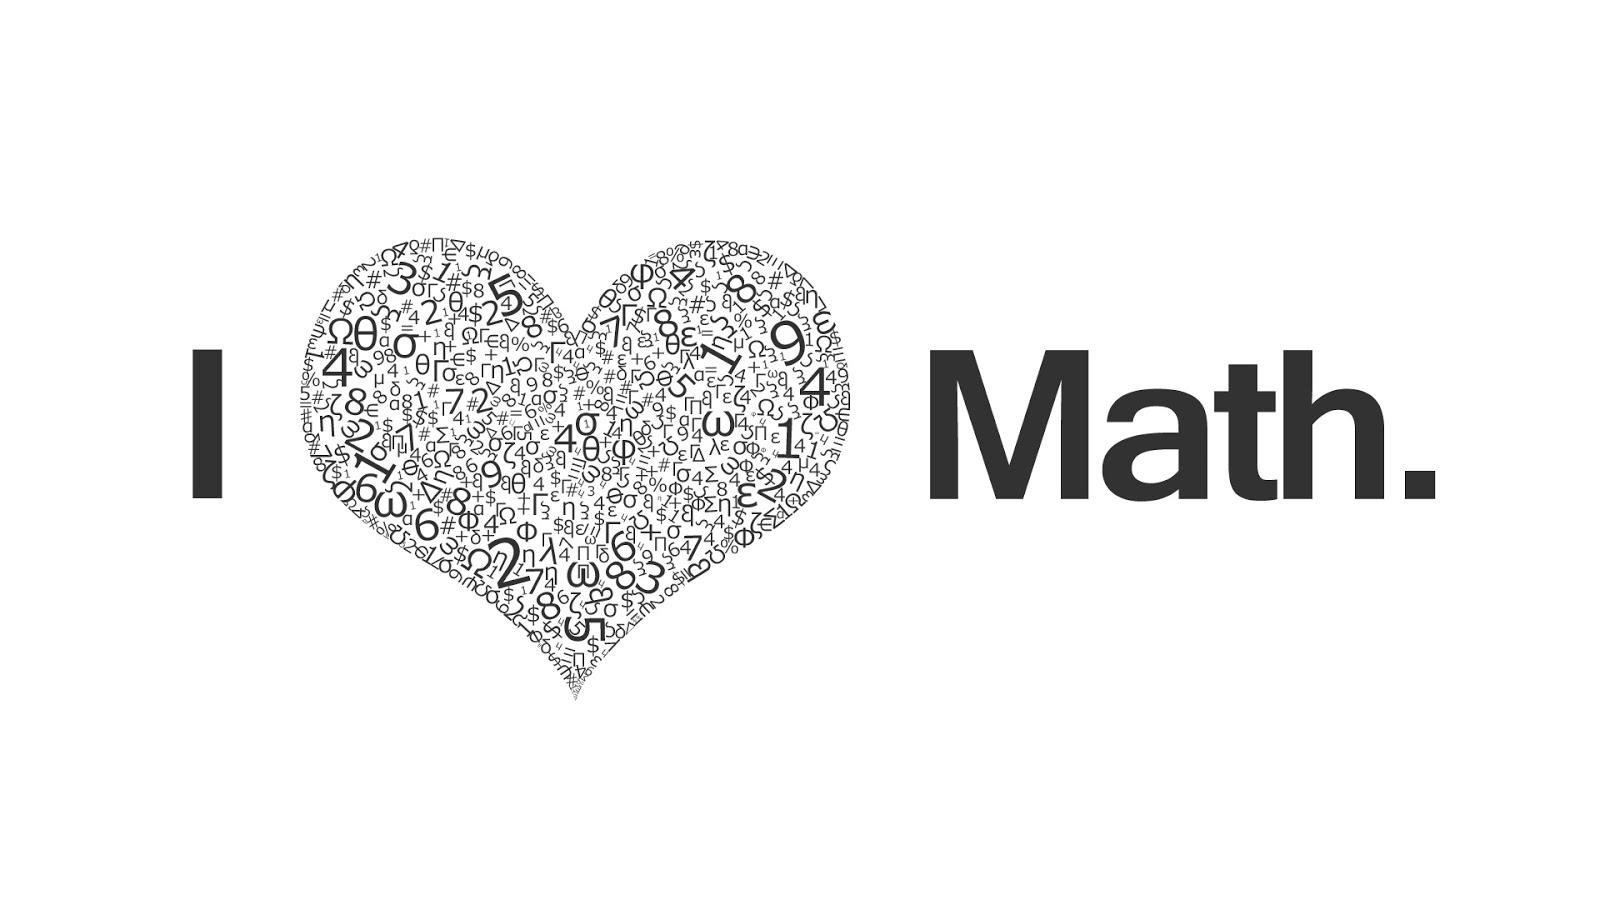 http://1.bp.blogspot.com/-UFvFTMWhKgk/UHg32-MRB_I/AAAAAAAAGqs/hee4KVOhV0E/s1600/Math_Wallpaper_1.jpg